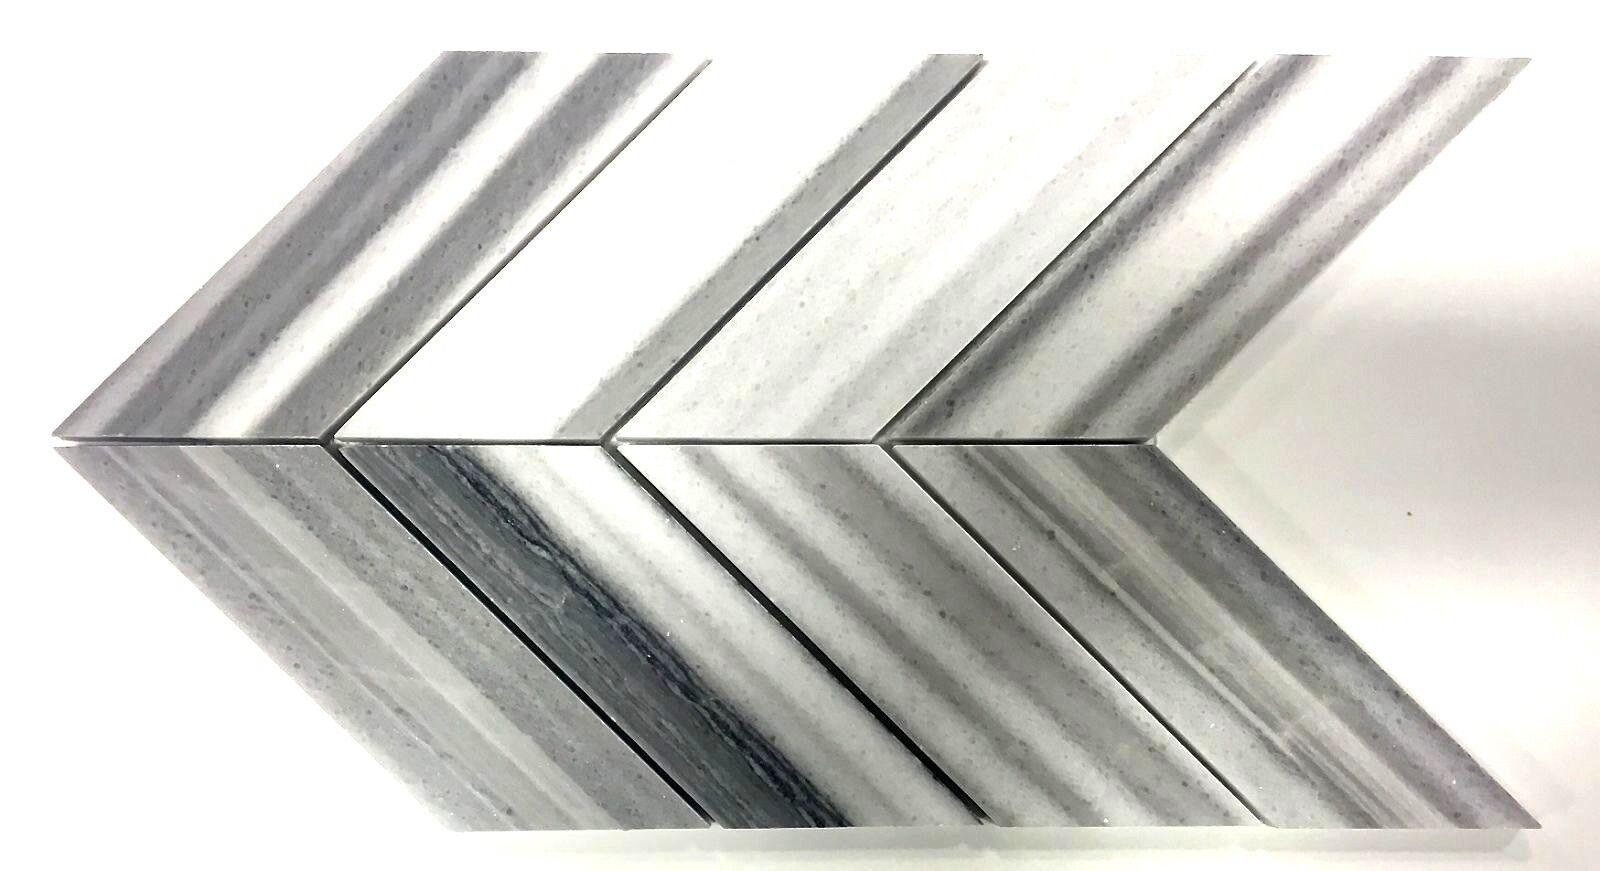 Gray Silver Chevron Marble 9X15 Mosaic Wall and Floor Tile Backsplash Bath